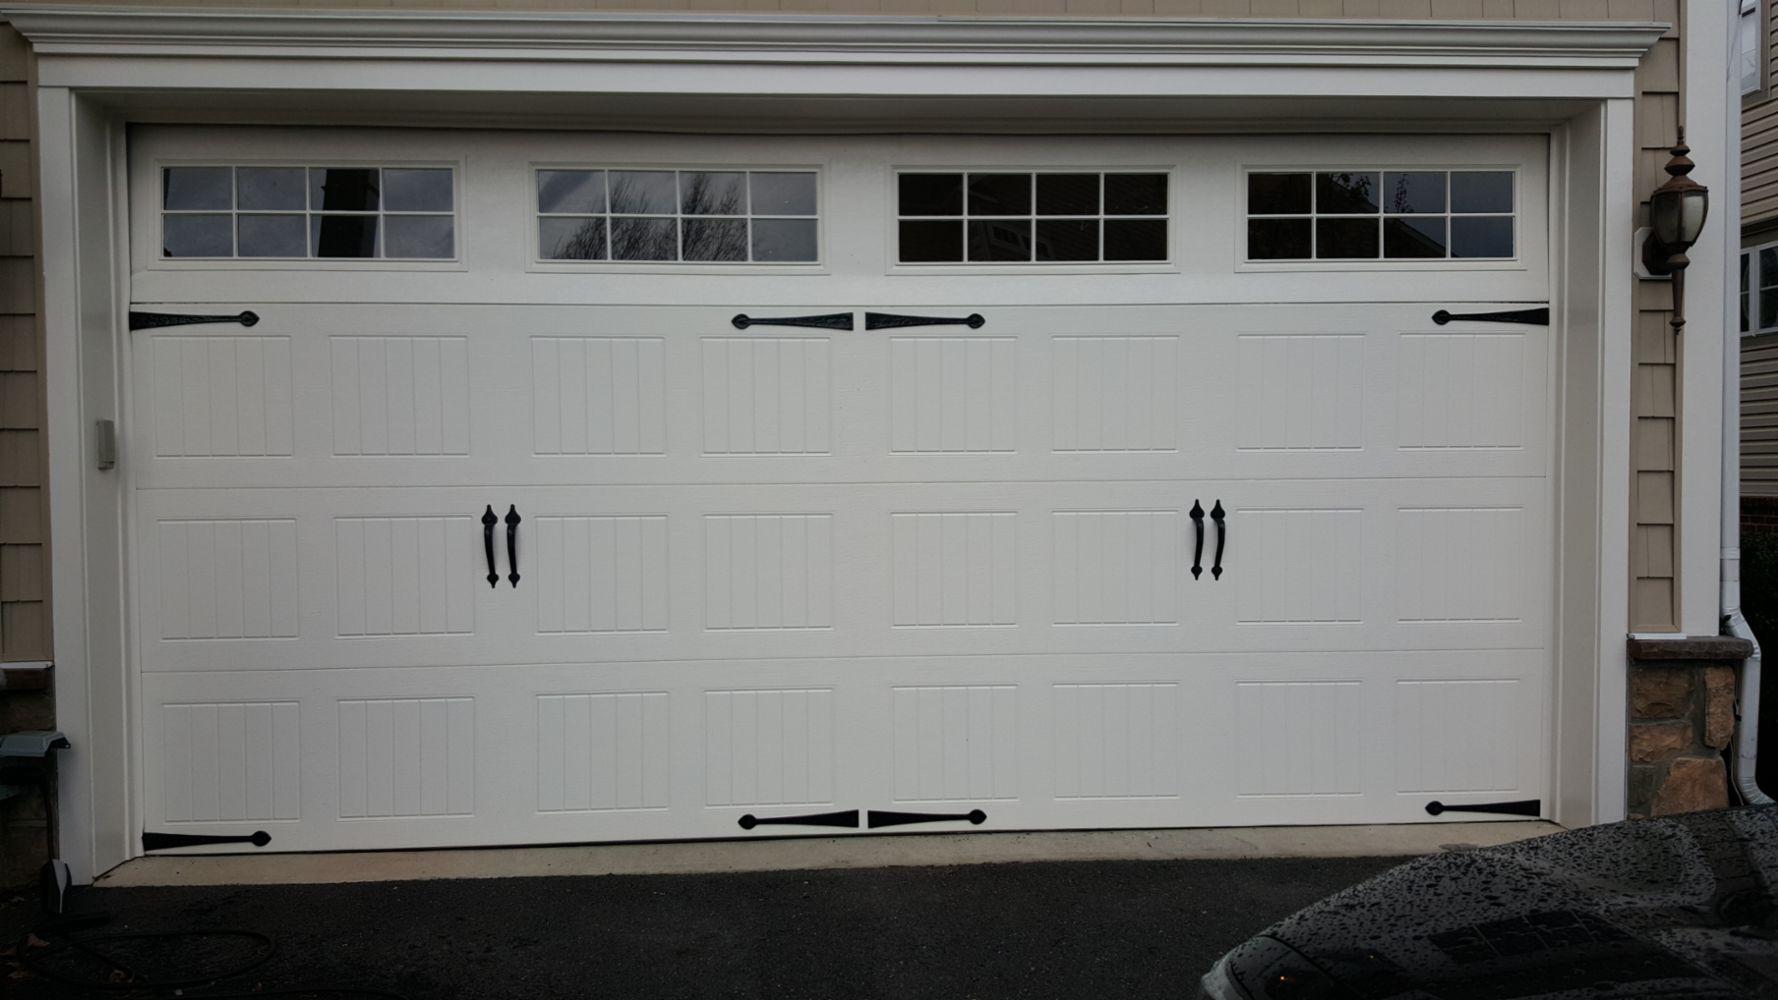 10002673198844481778 24H Garage Door Repair U0026 Gate Reapir Company In Washington  DC All #57504A Overhead